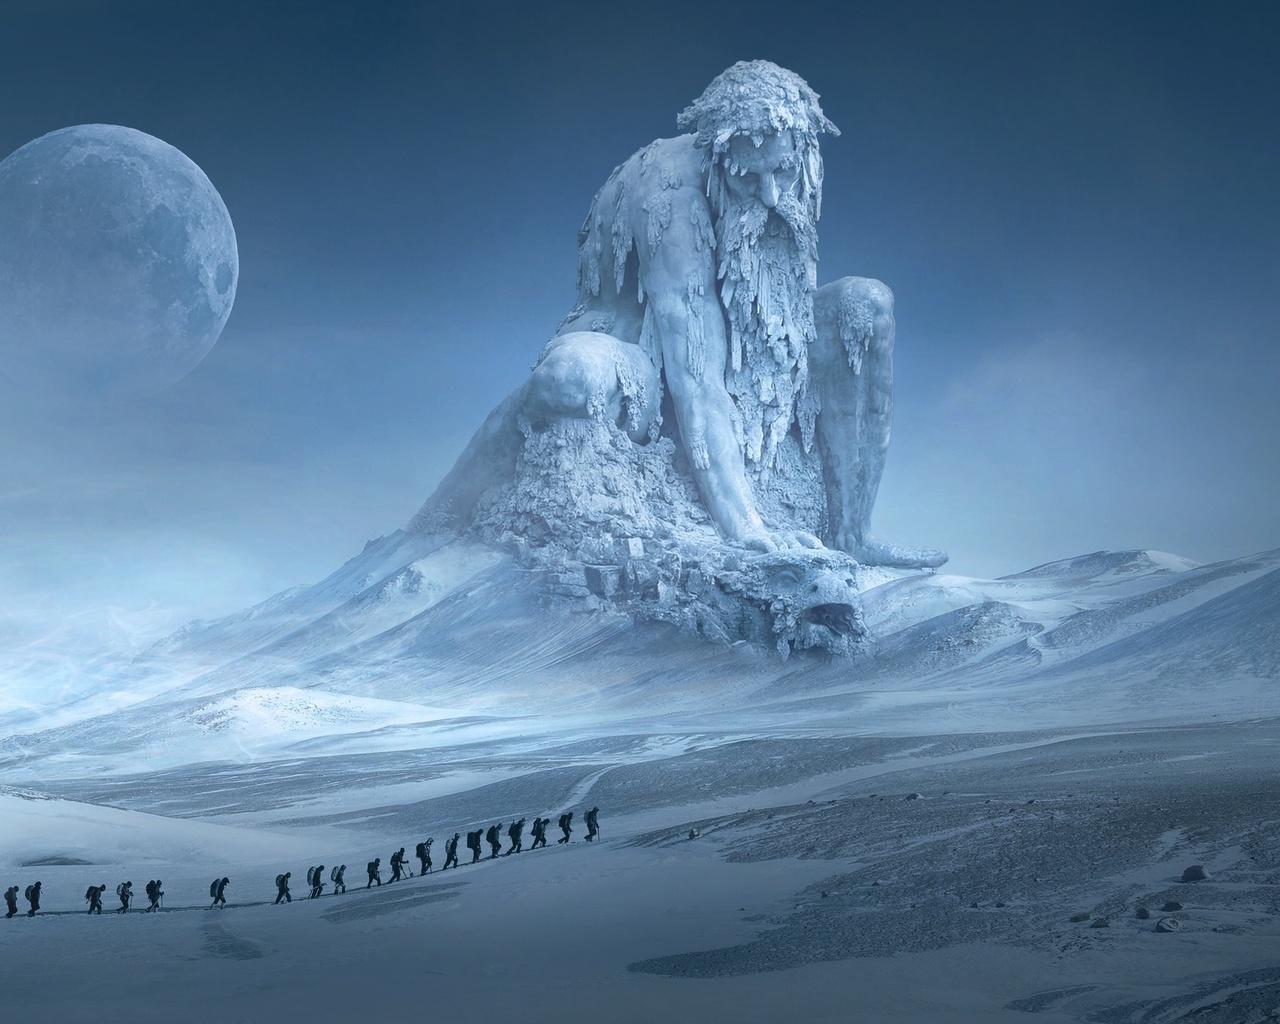 статуя, снег, зима, луна, странники